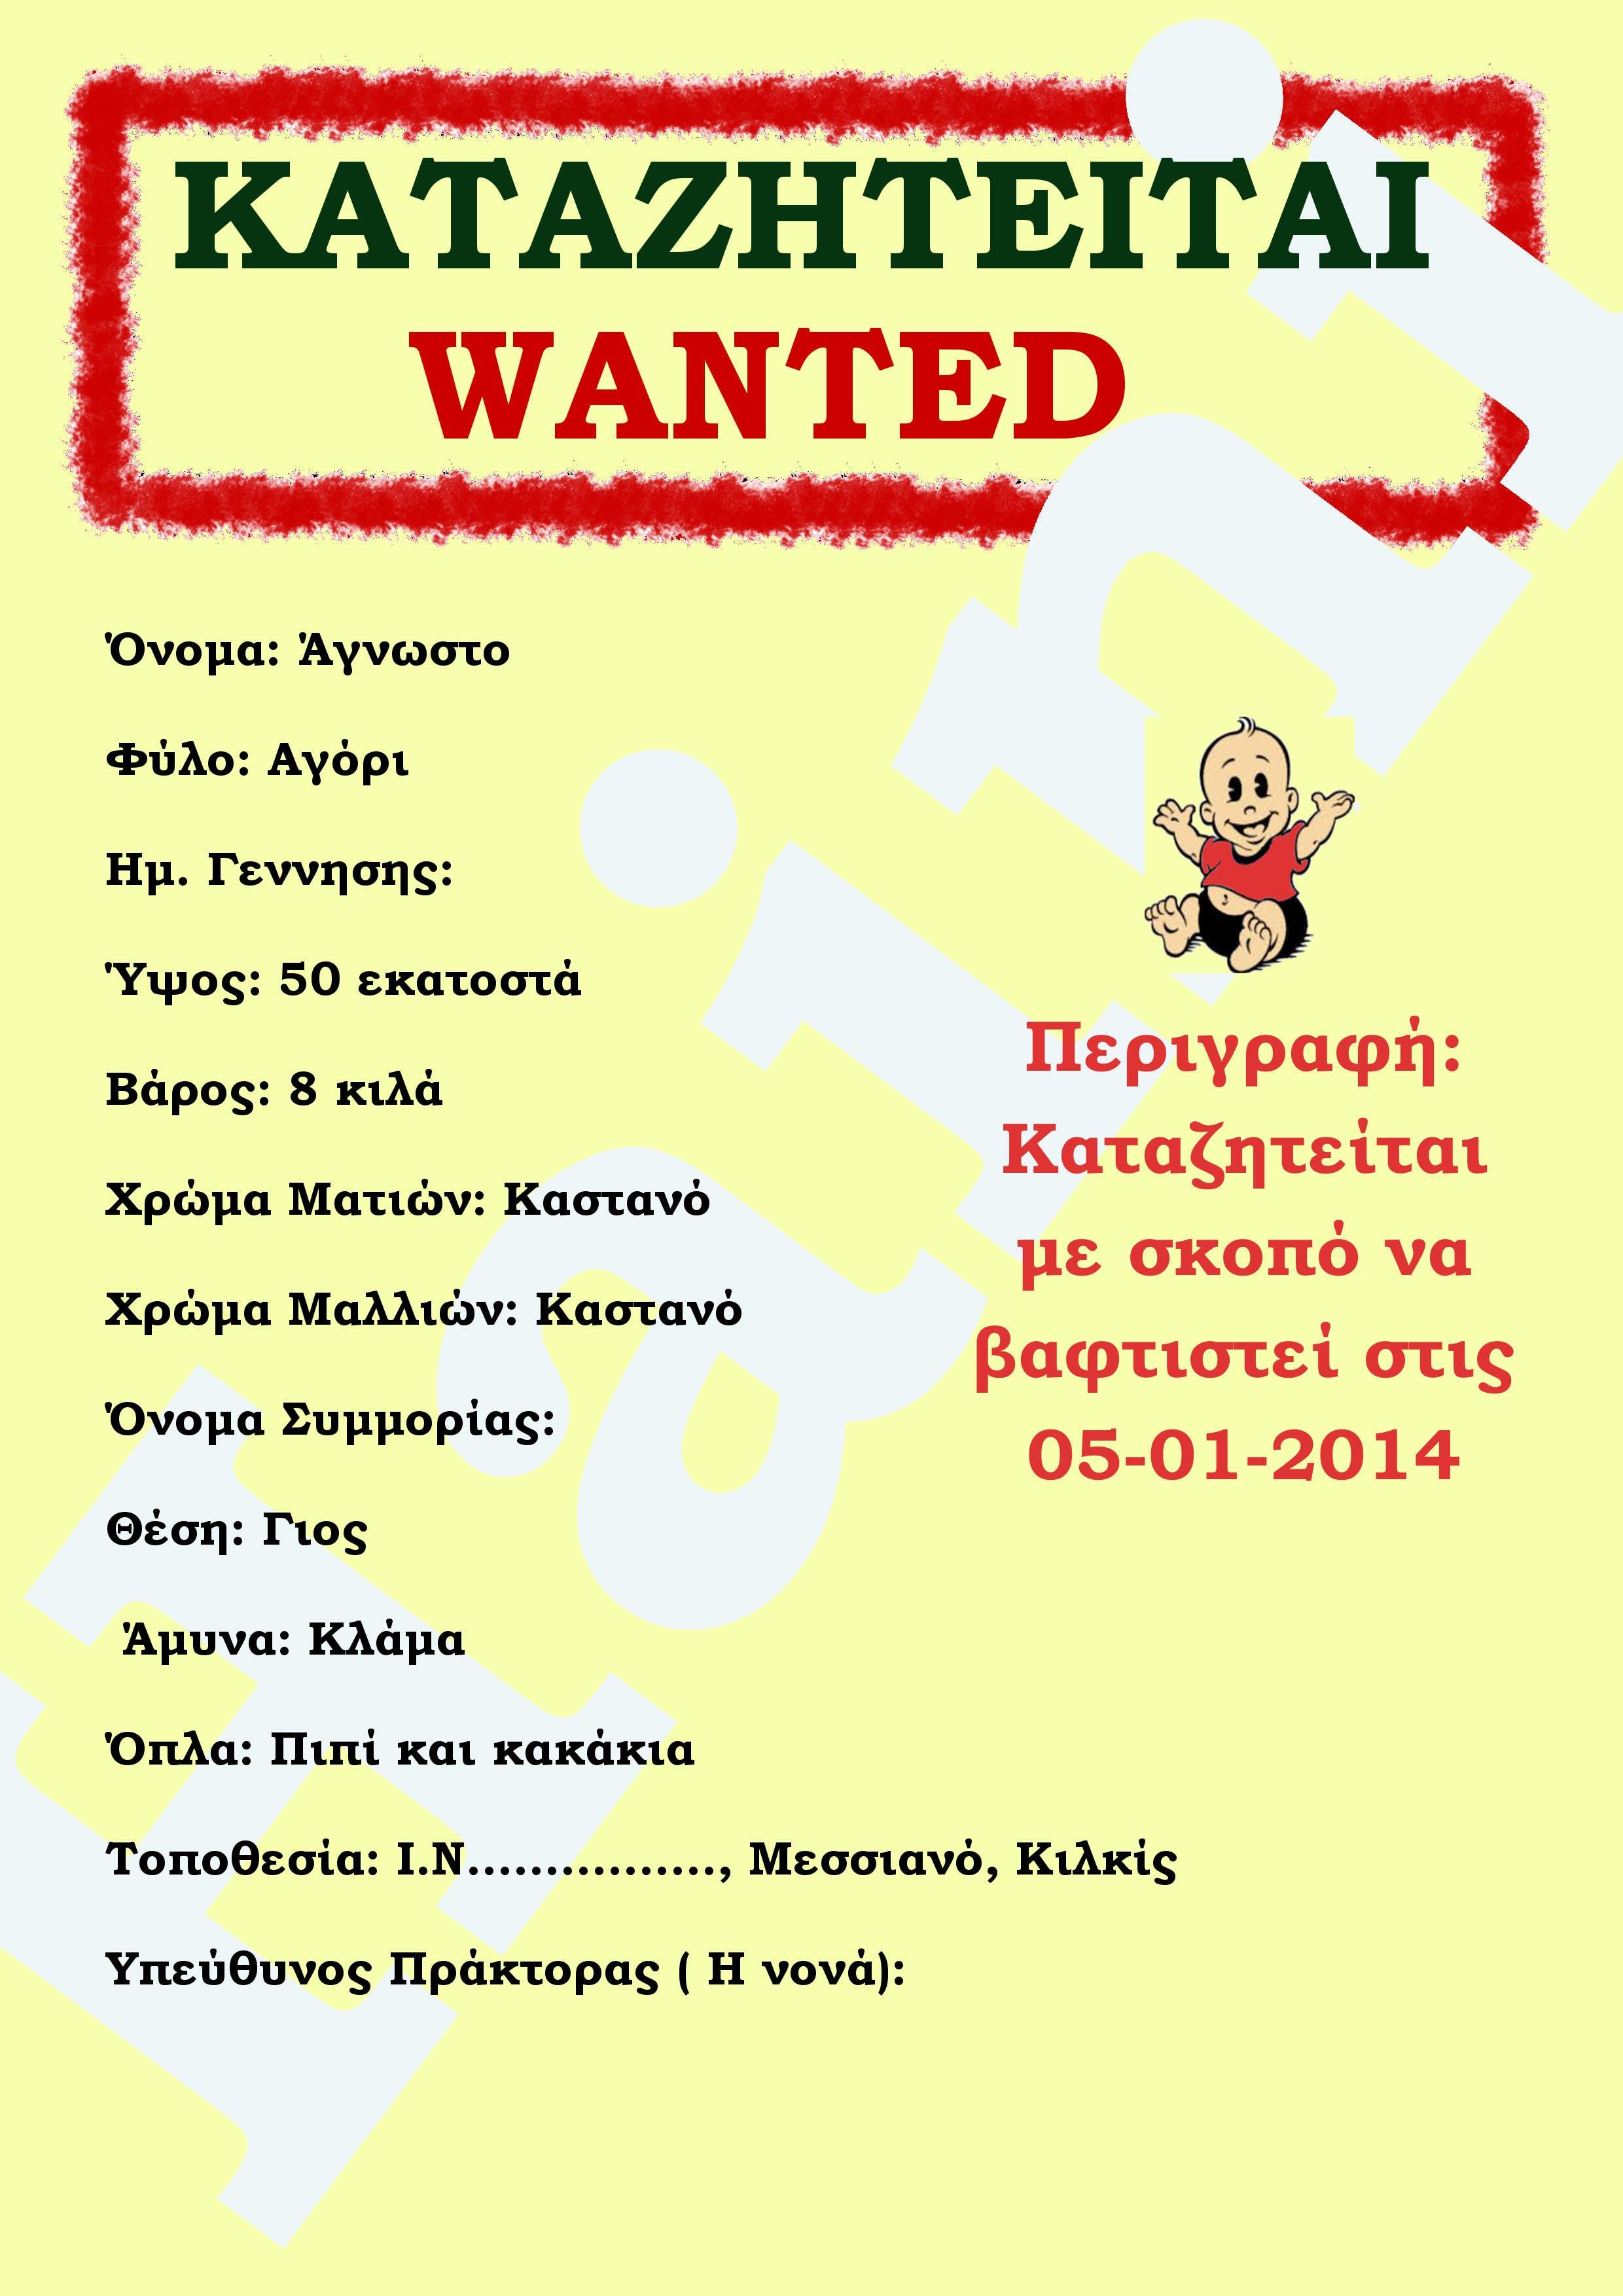 Wanted-baptism invitation